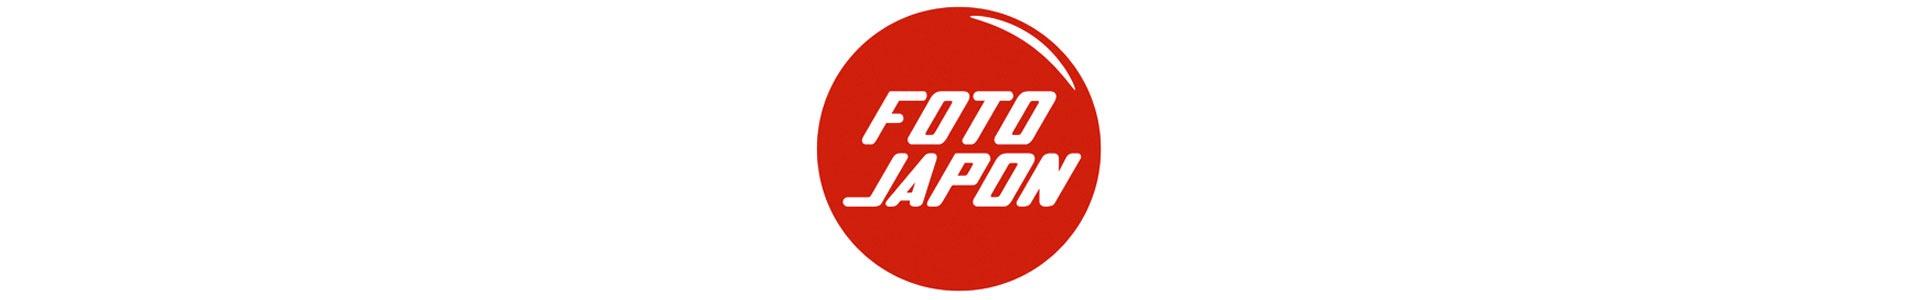 FotoJapan